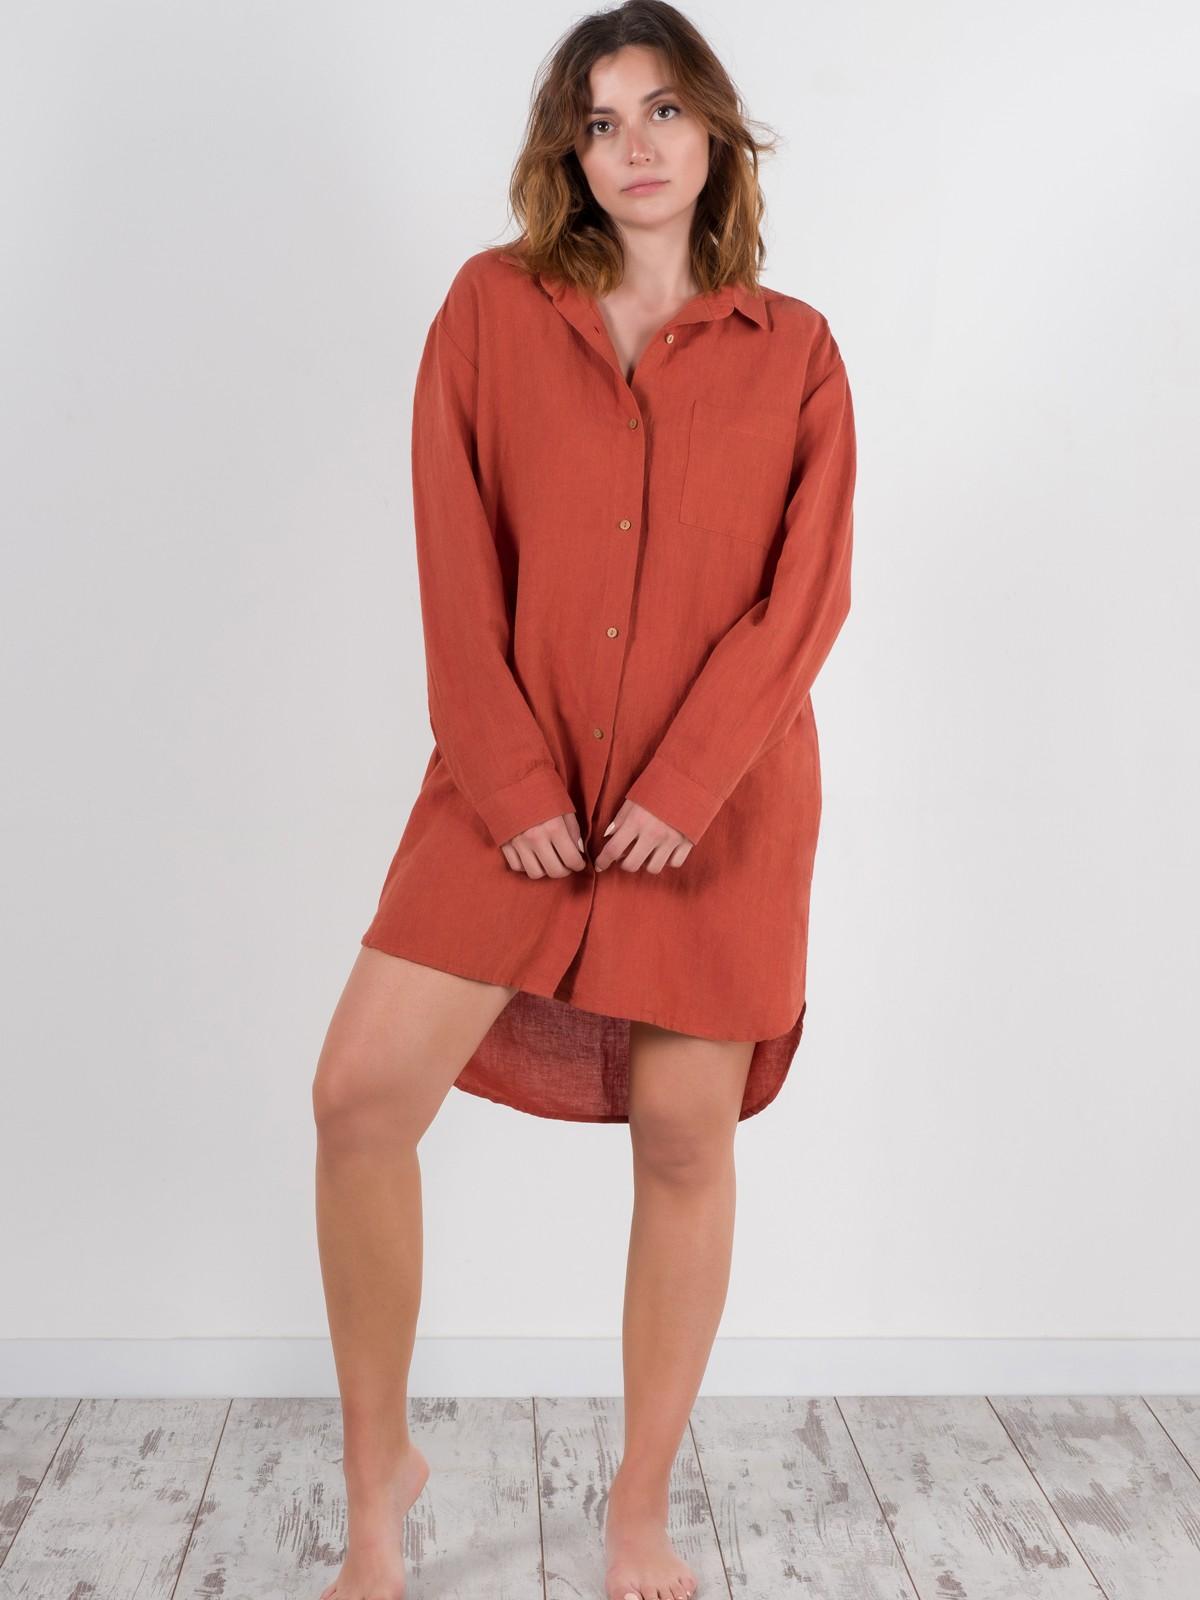 turuncu-gomlek-elbise1-1200x1600w